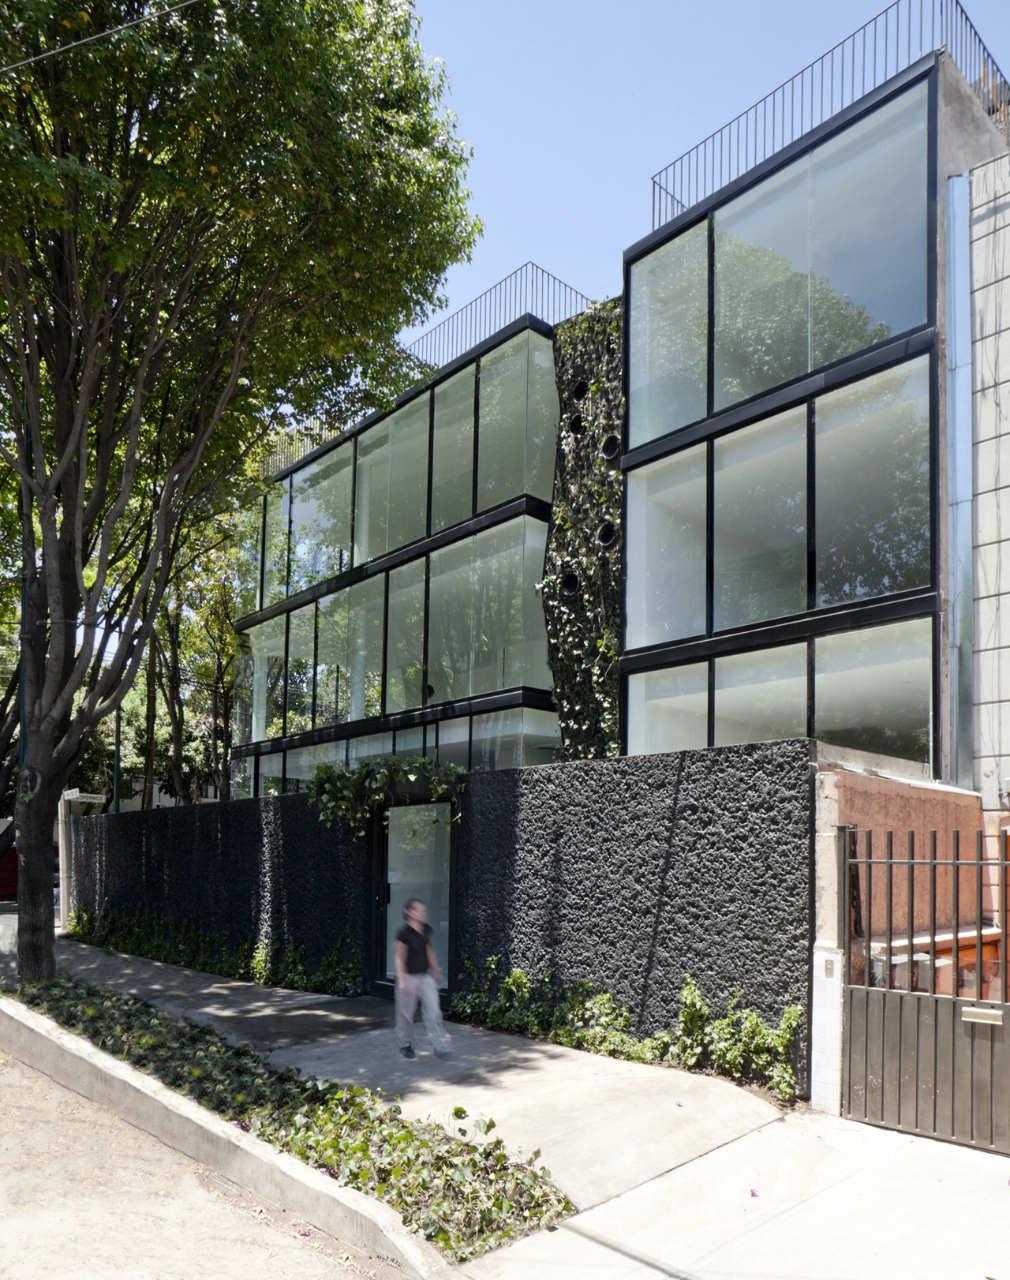 Michelet 50 / Dellekamp Arquitectos, © Sandra Pereznieto